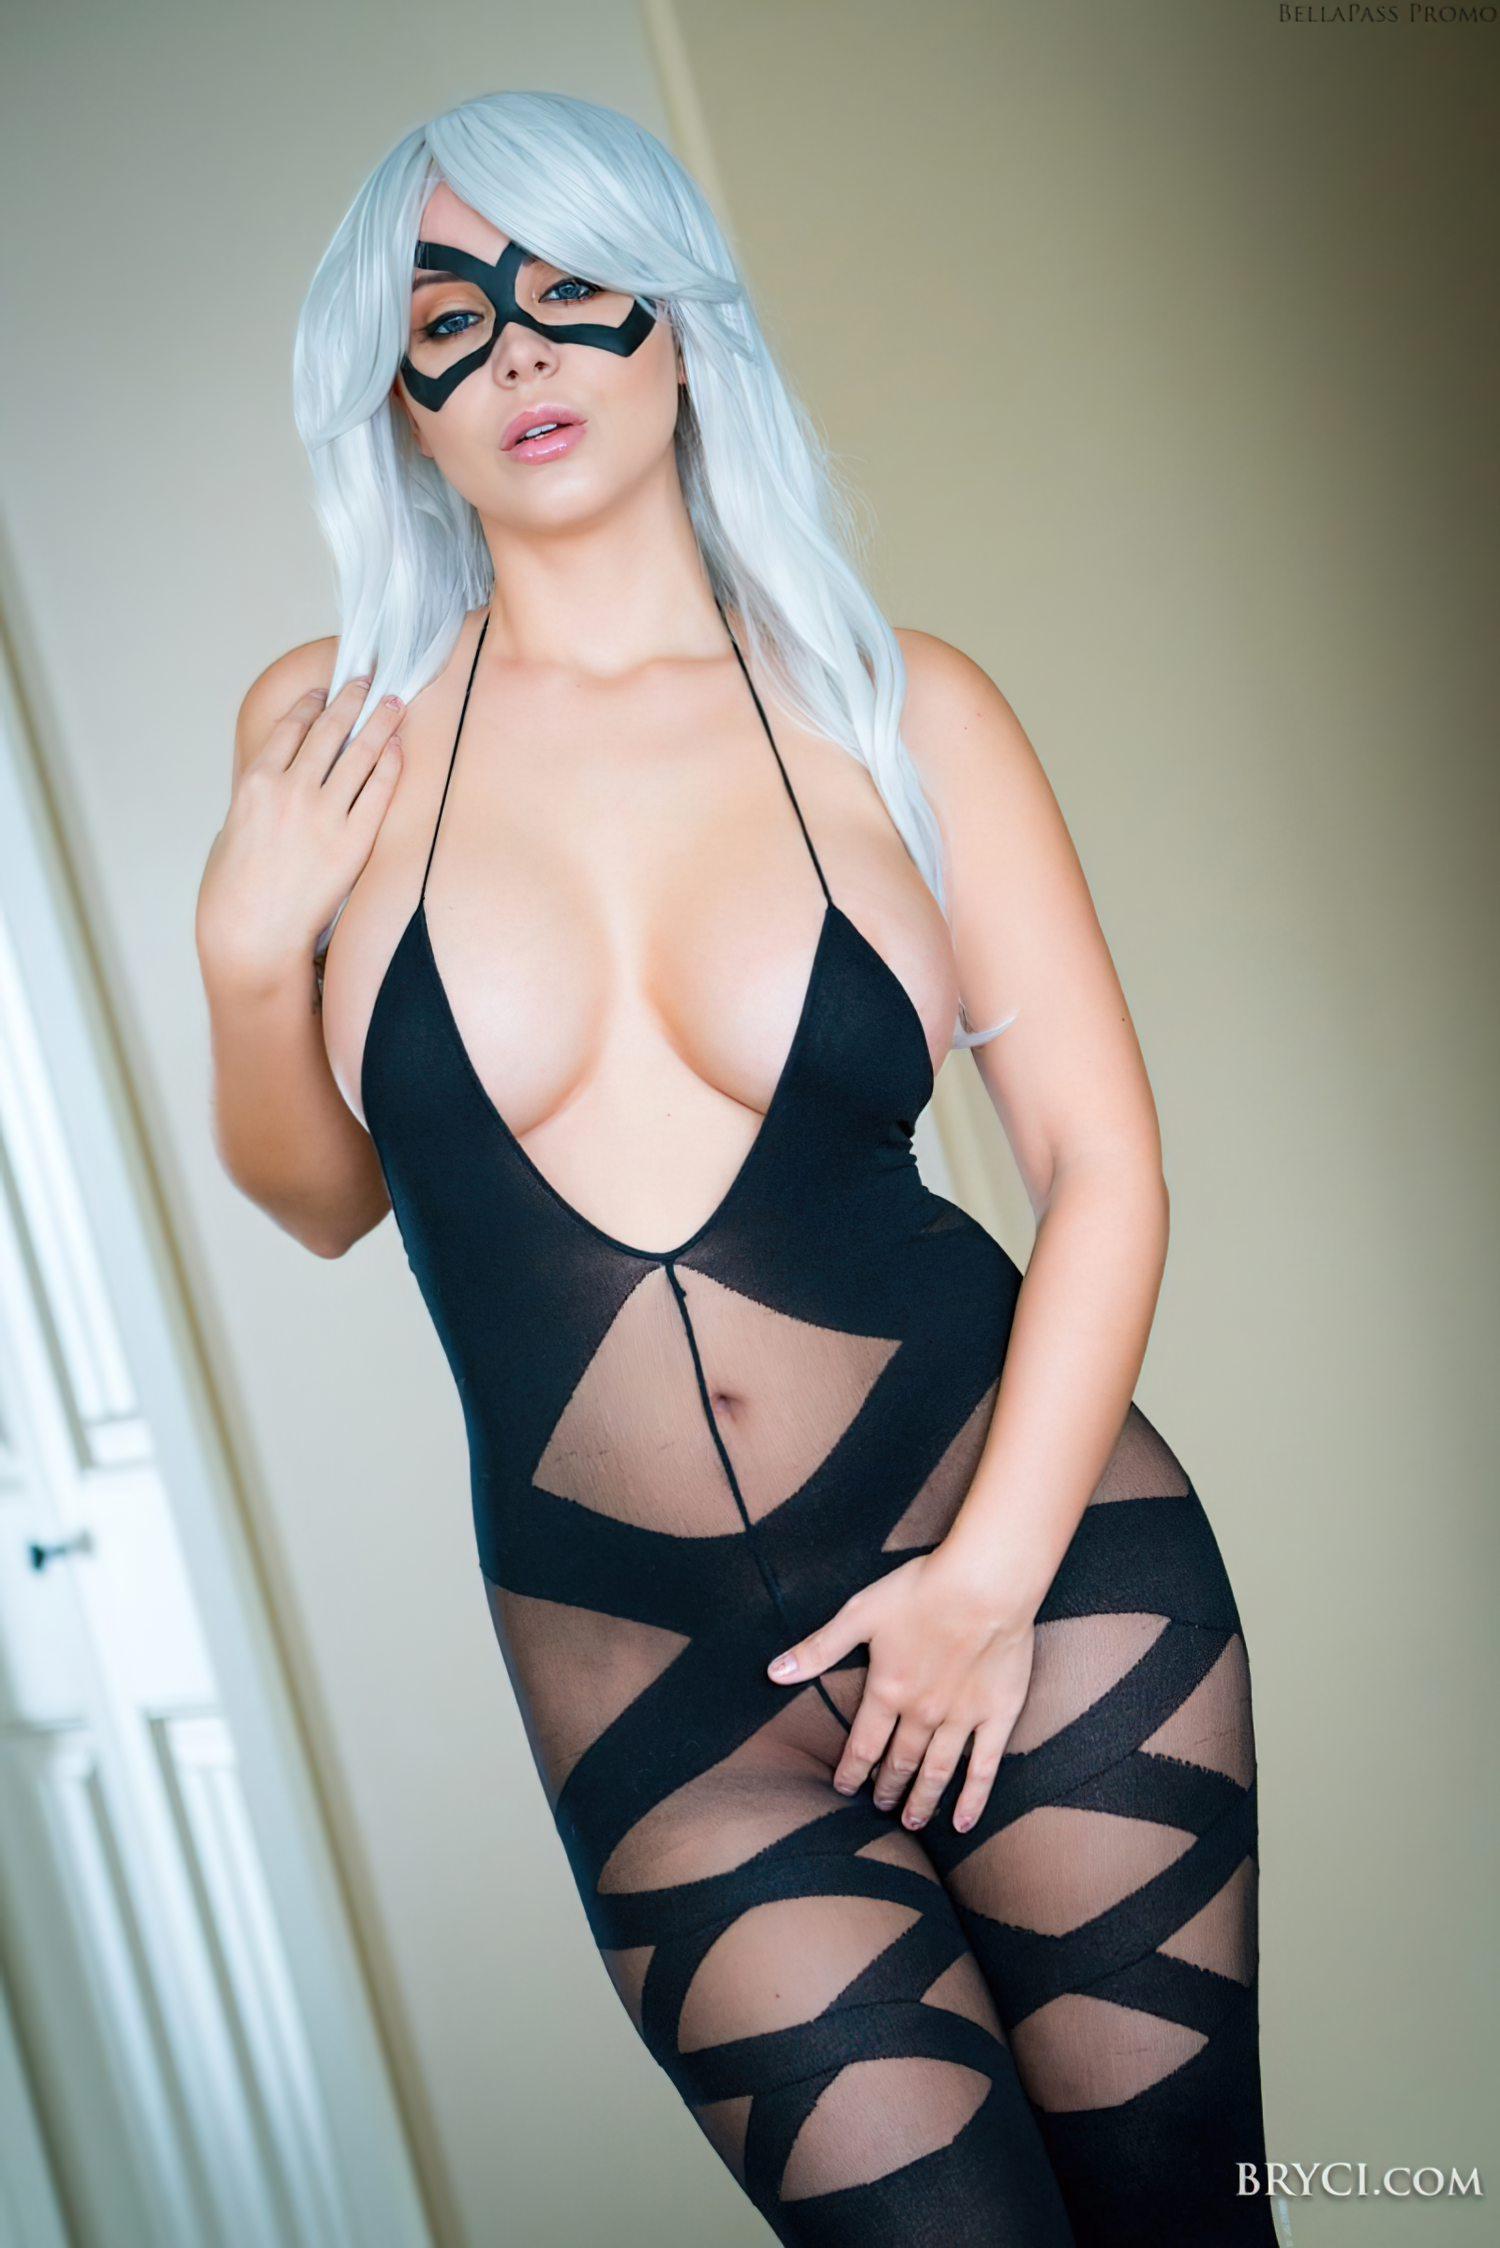 Bryci Catwoman Nua (1)